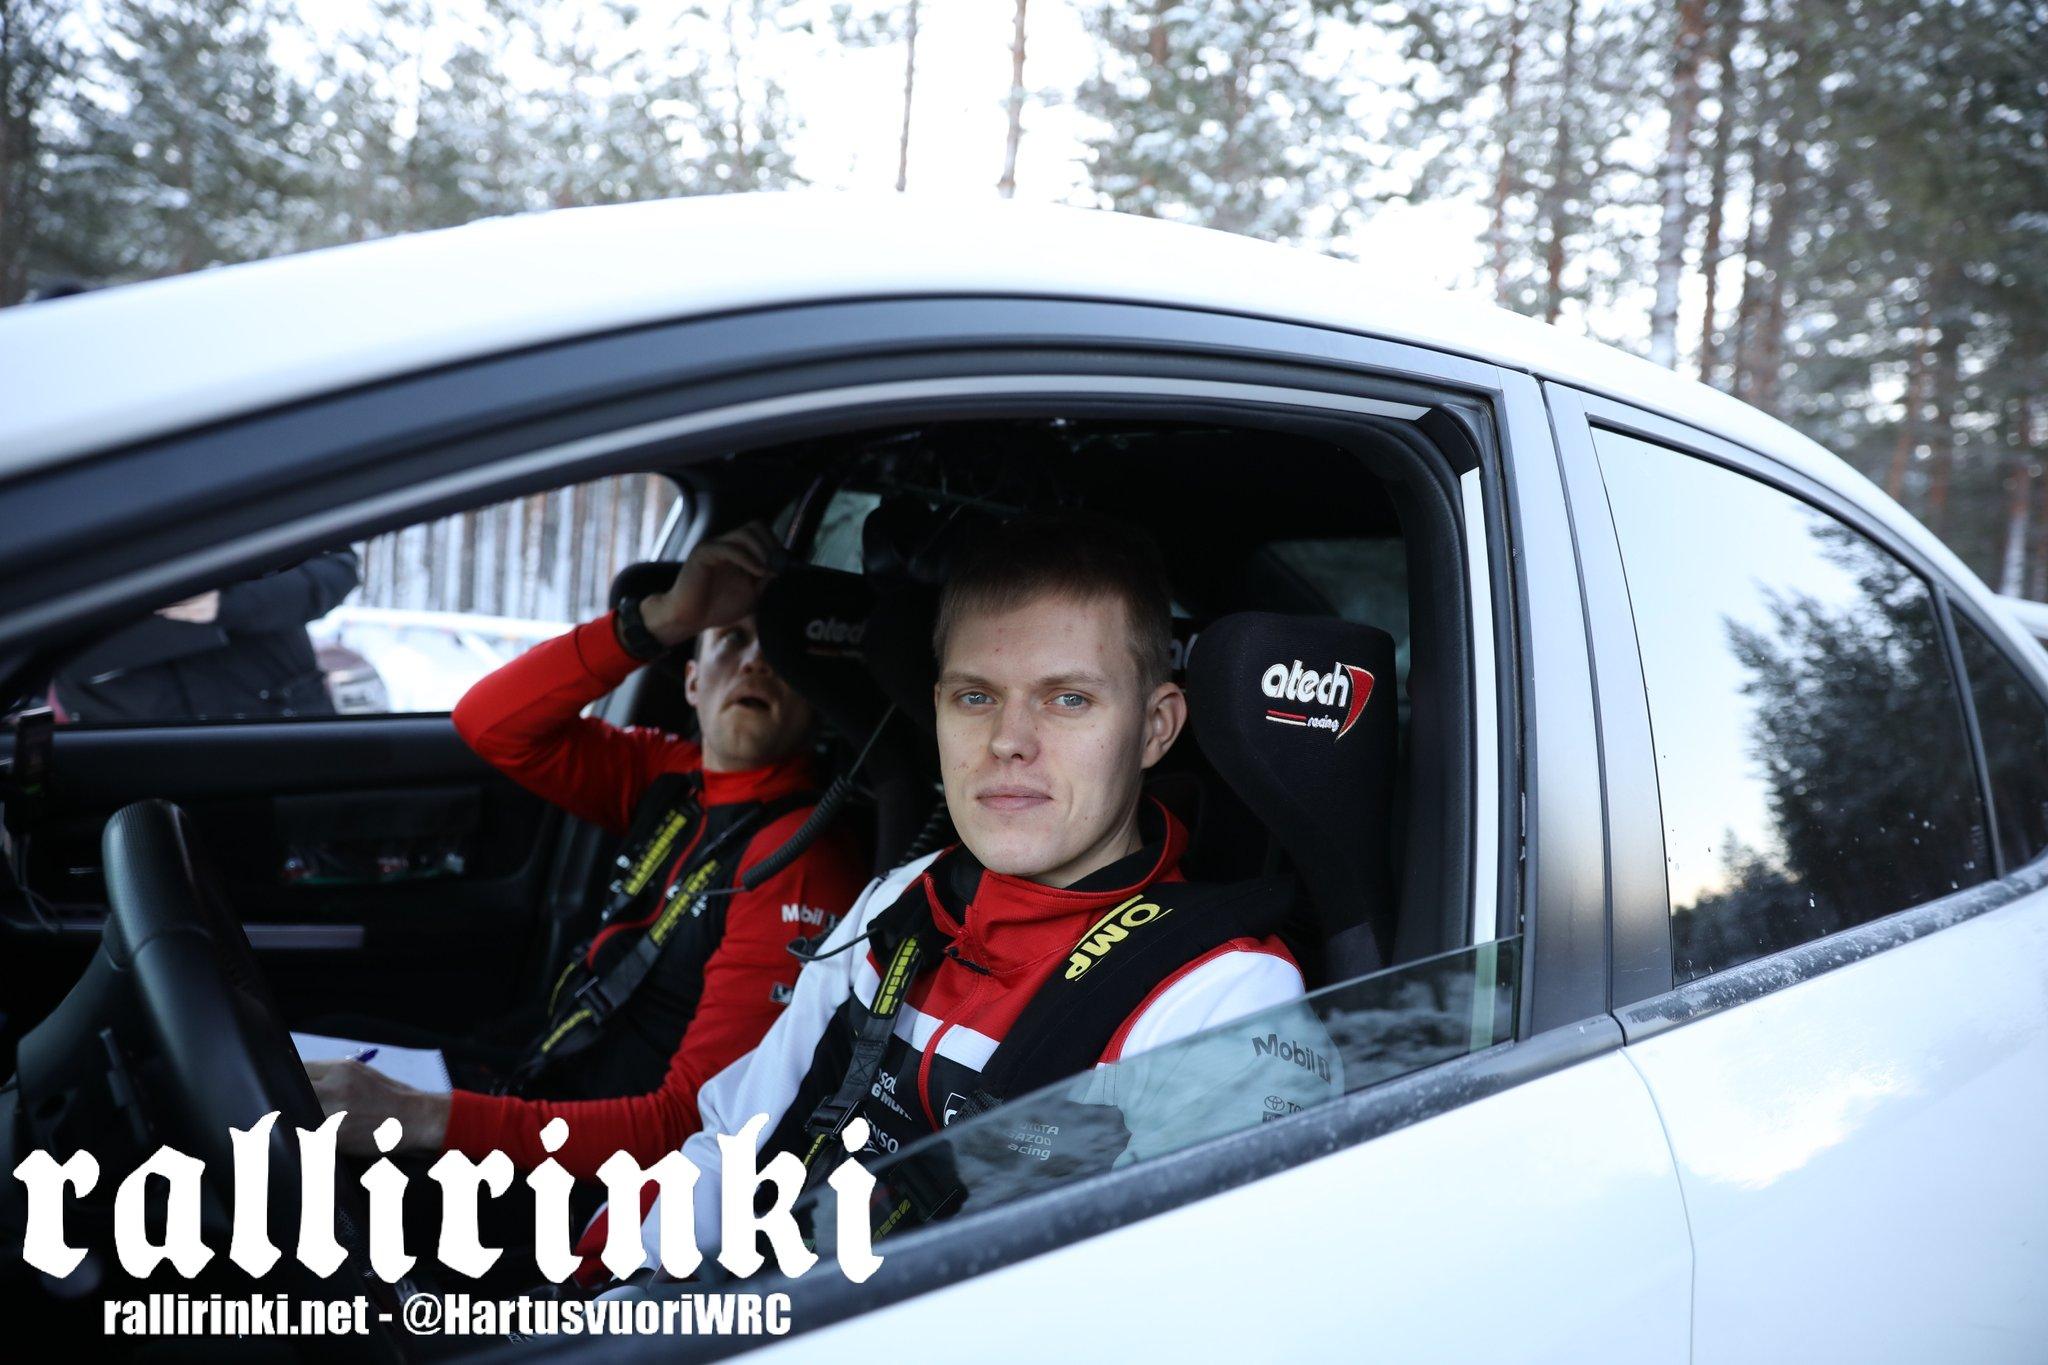 WRC: 67º Rallye Sweden [14-17 Febrero] - Página 2 DzMQLMaW0AEApik